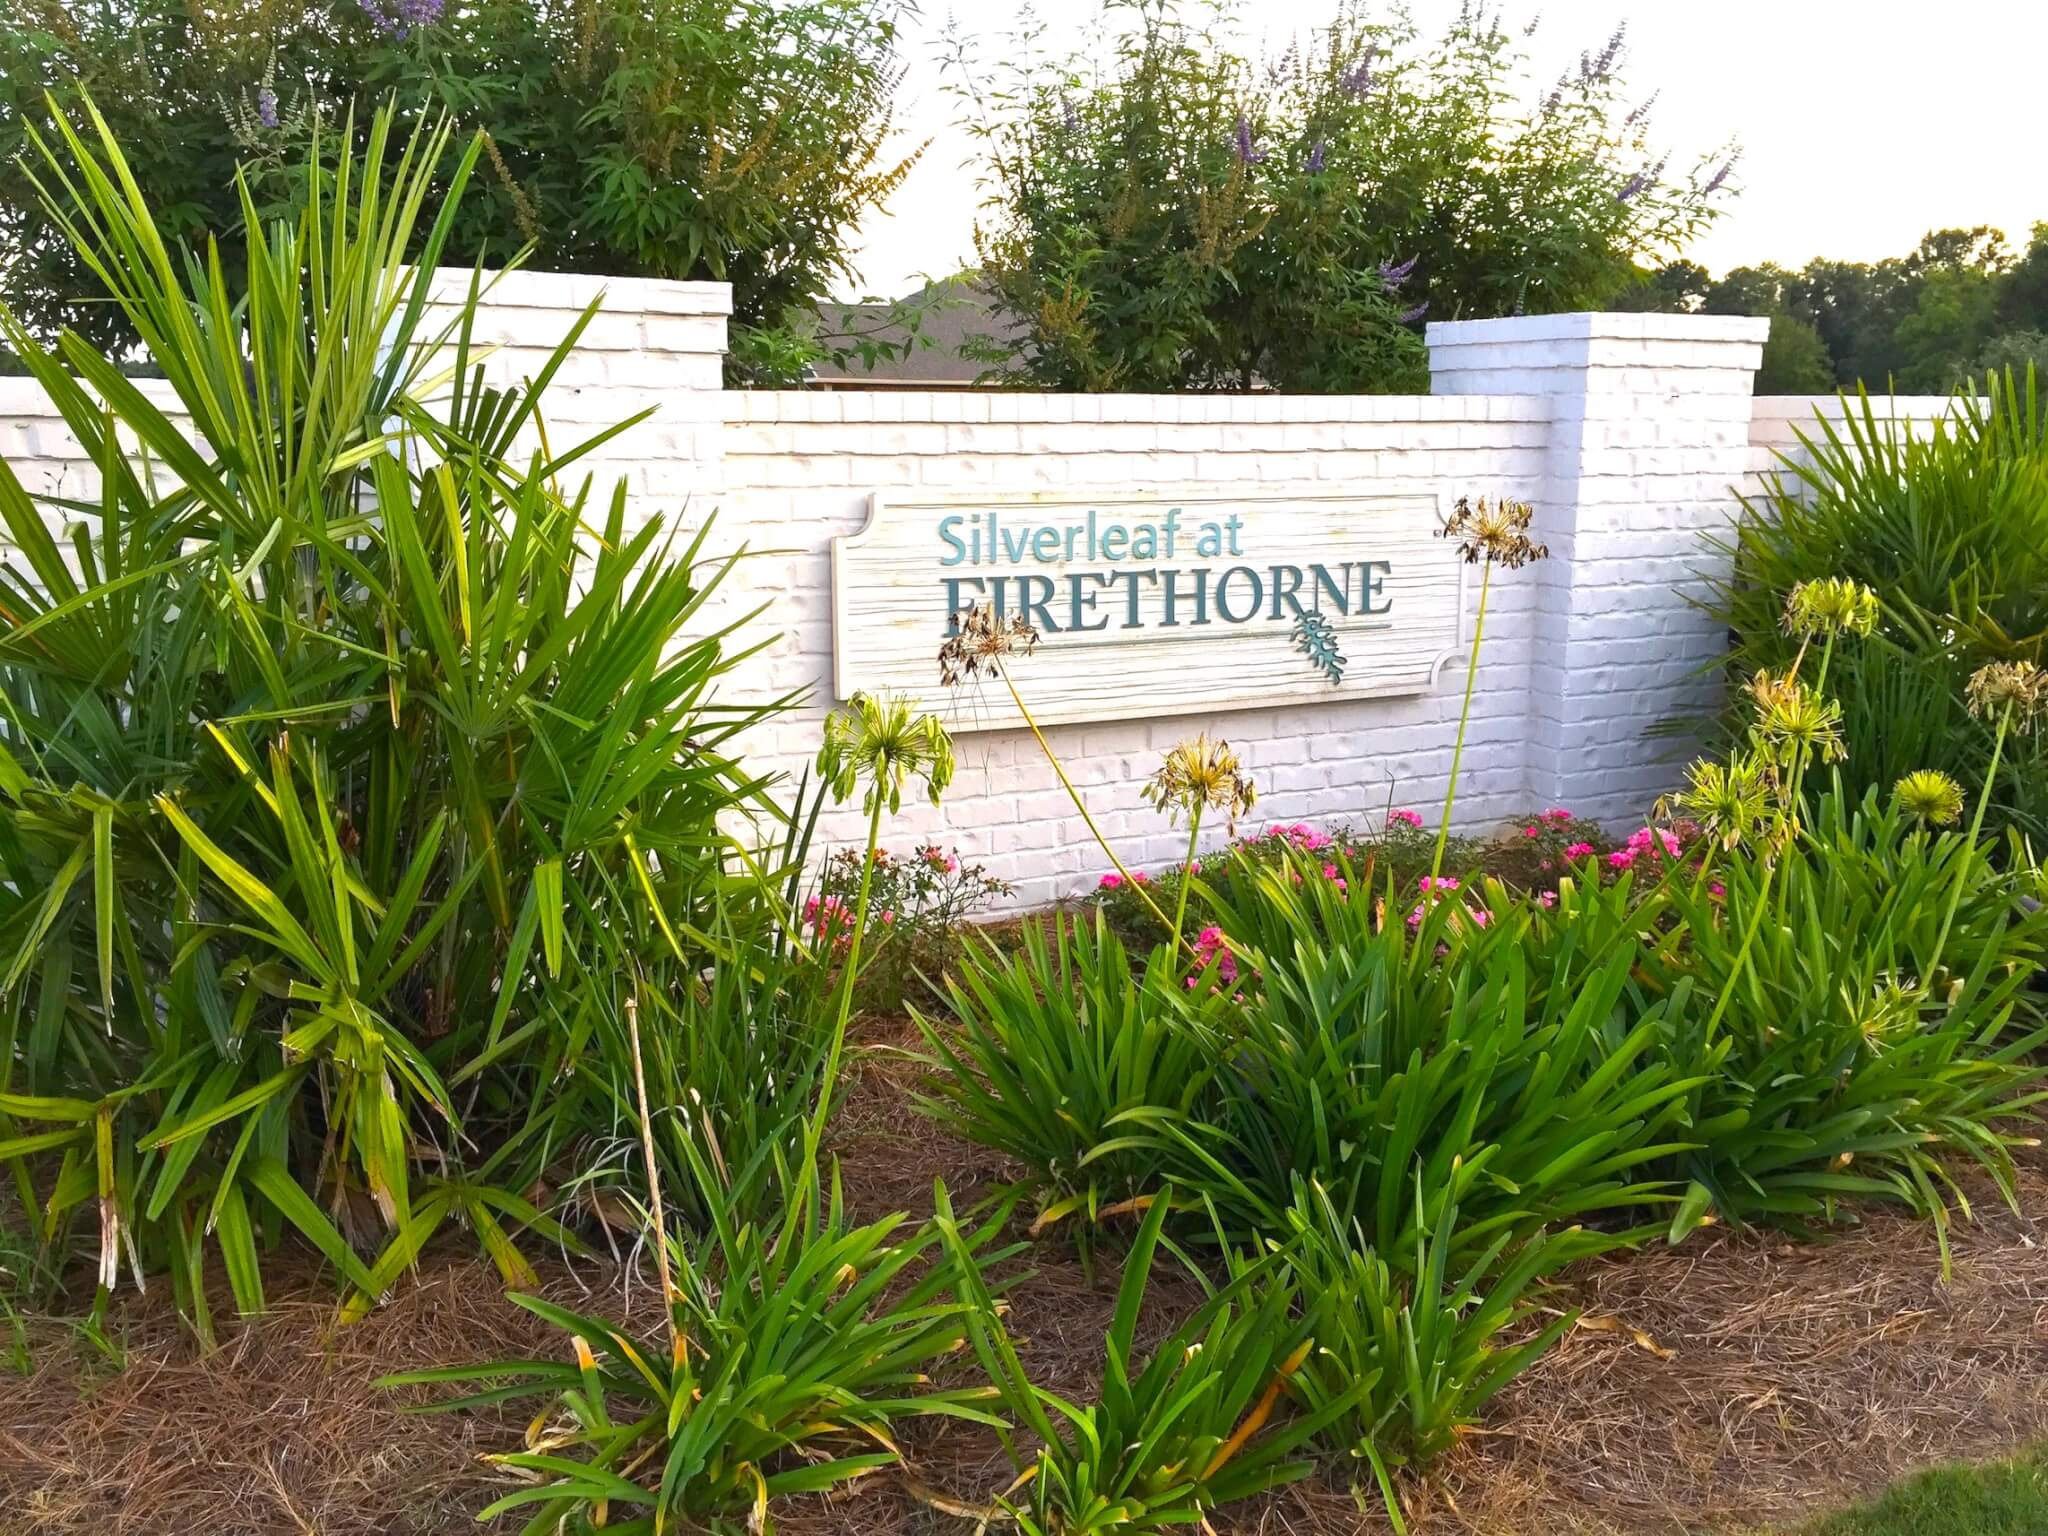 Silverleaf at Firethorne Sign